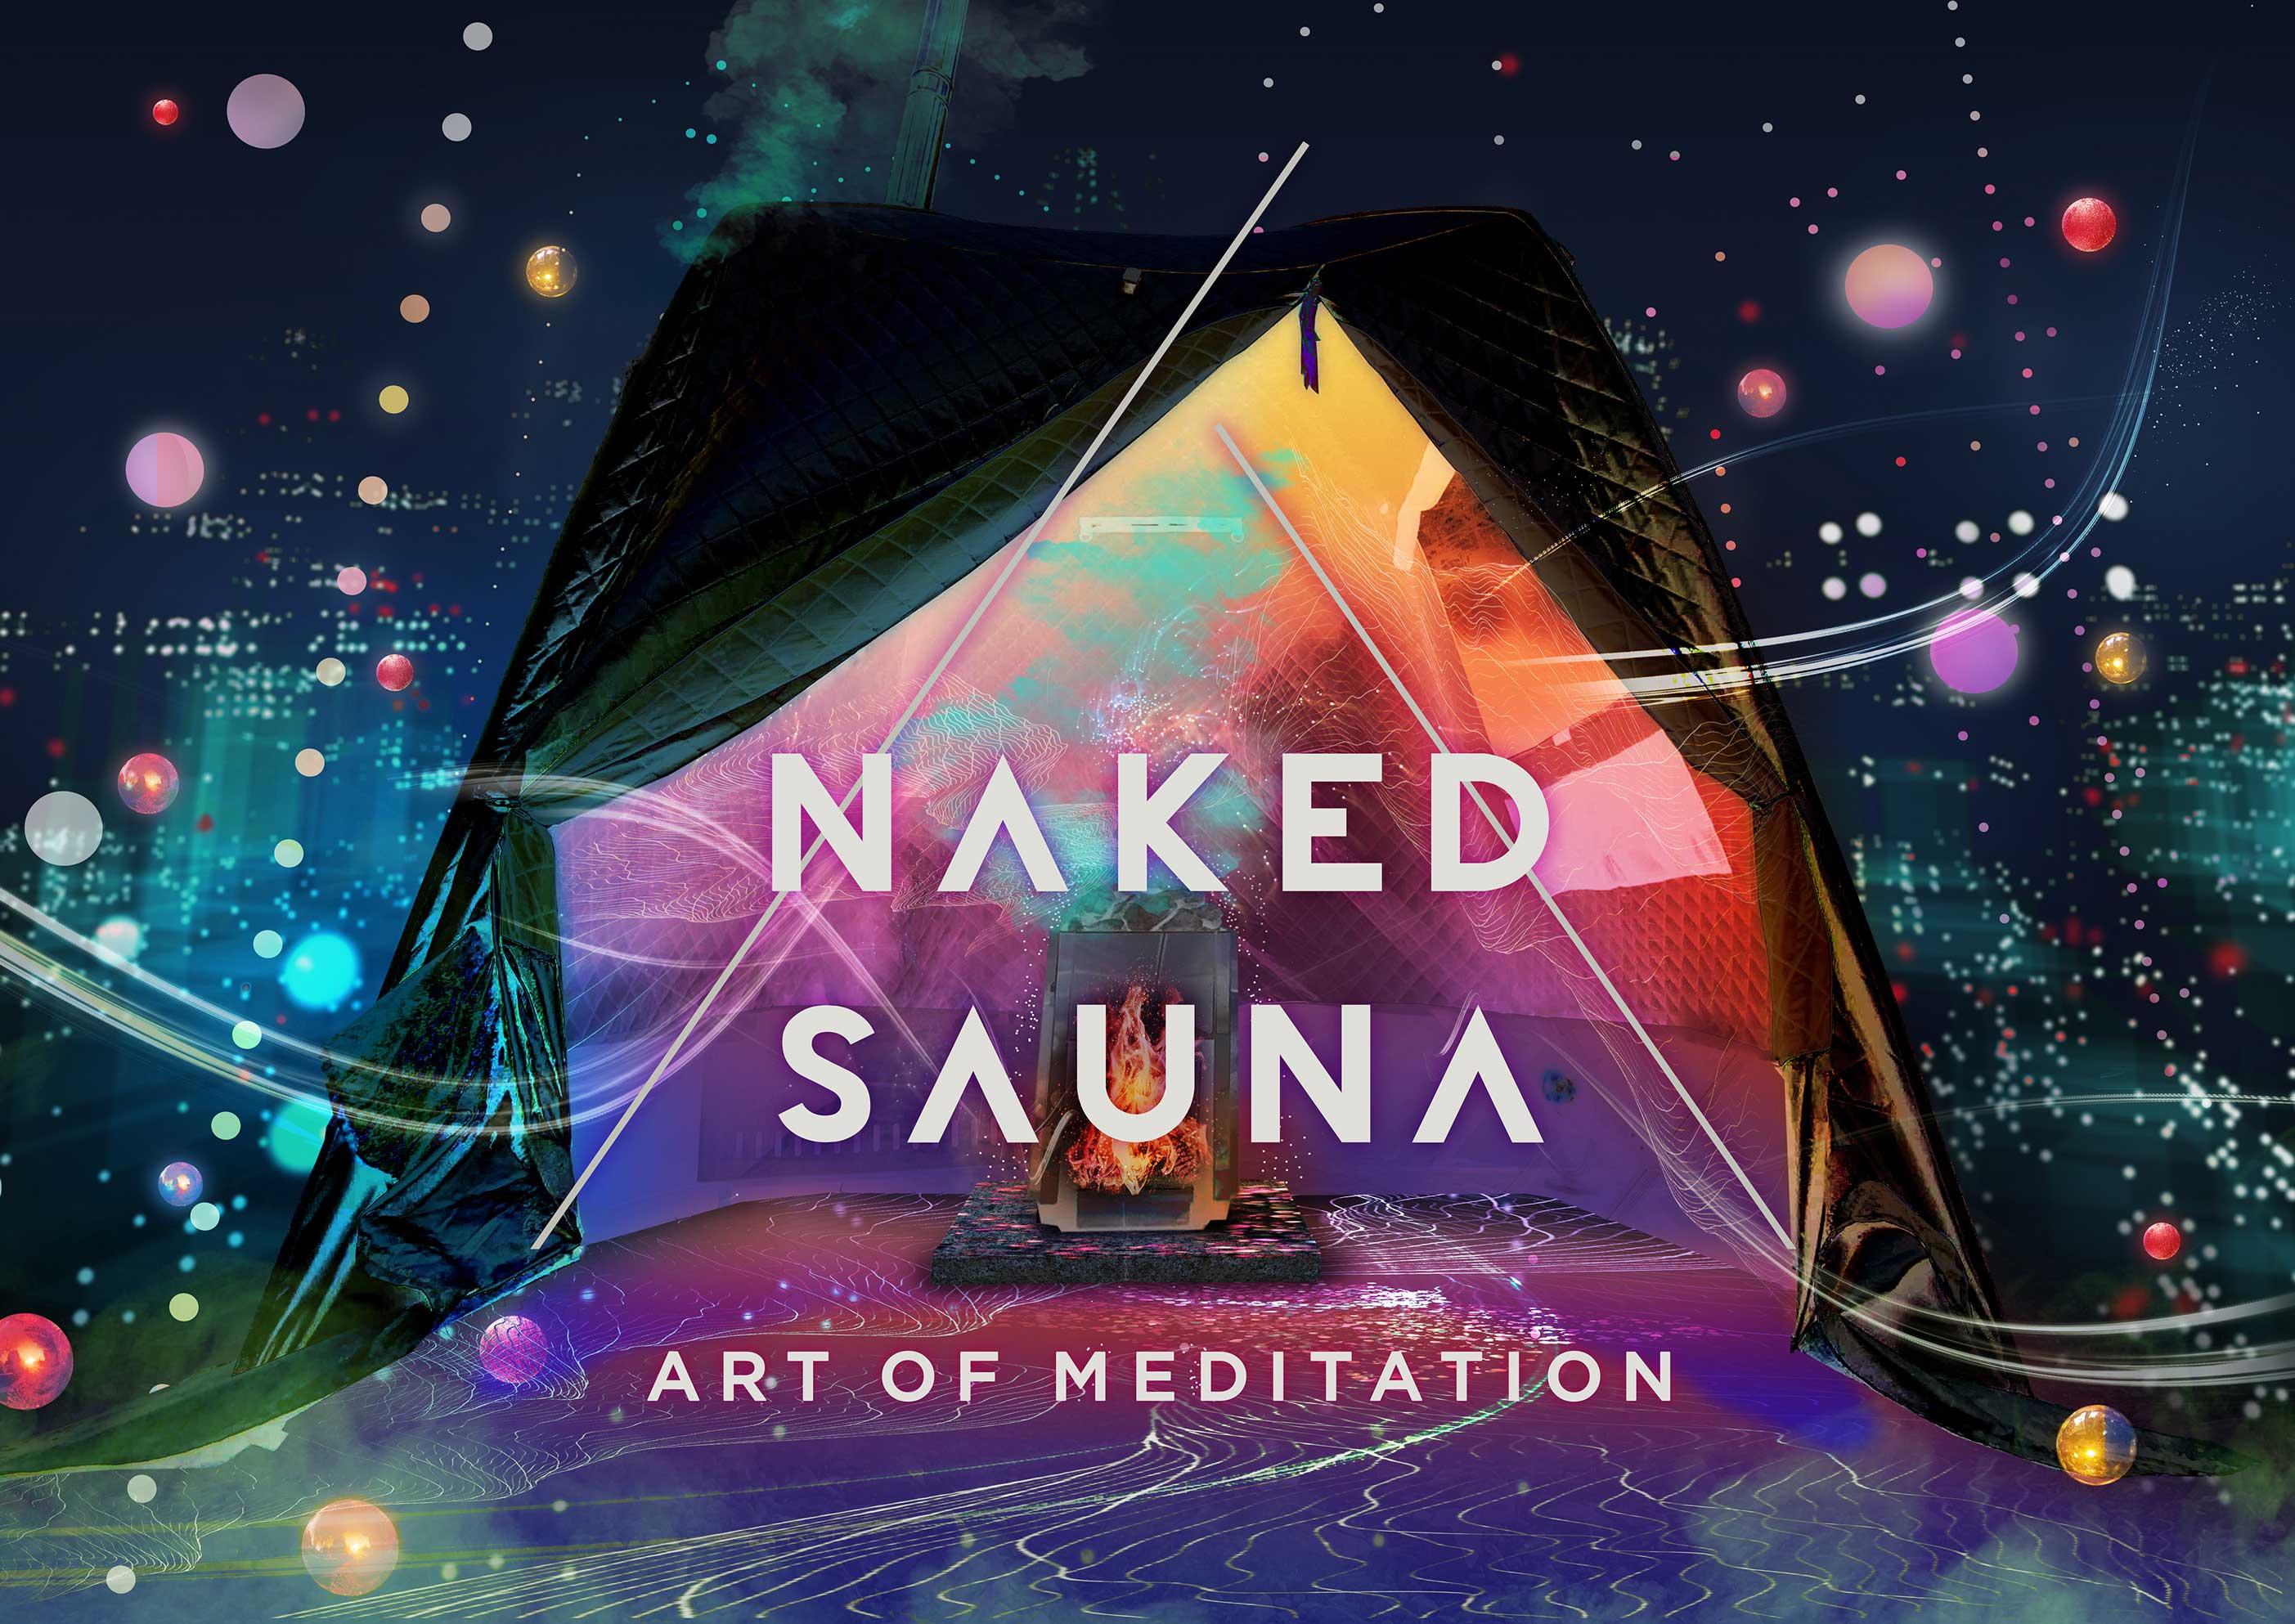 NAKED SAUNA -ART OF MEDITATION-